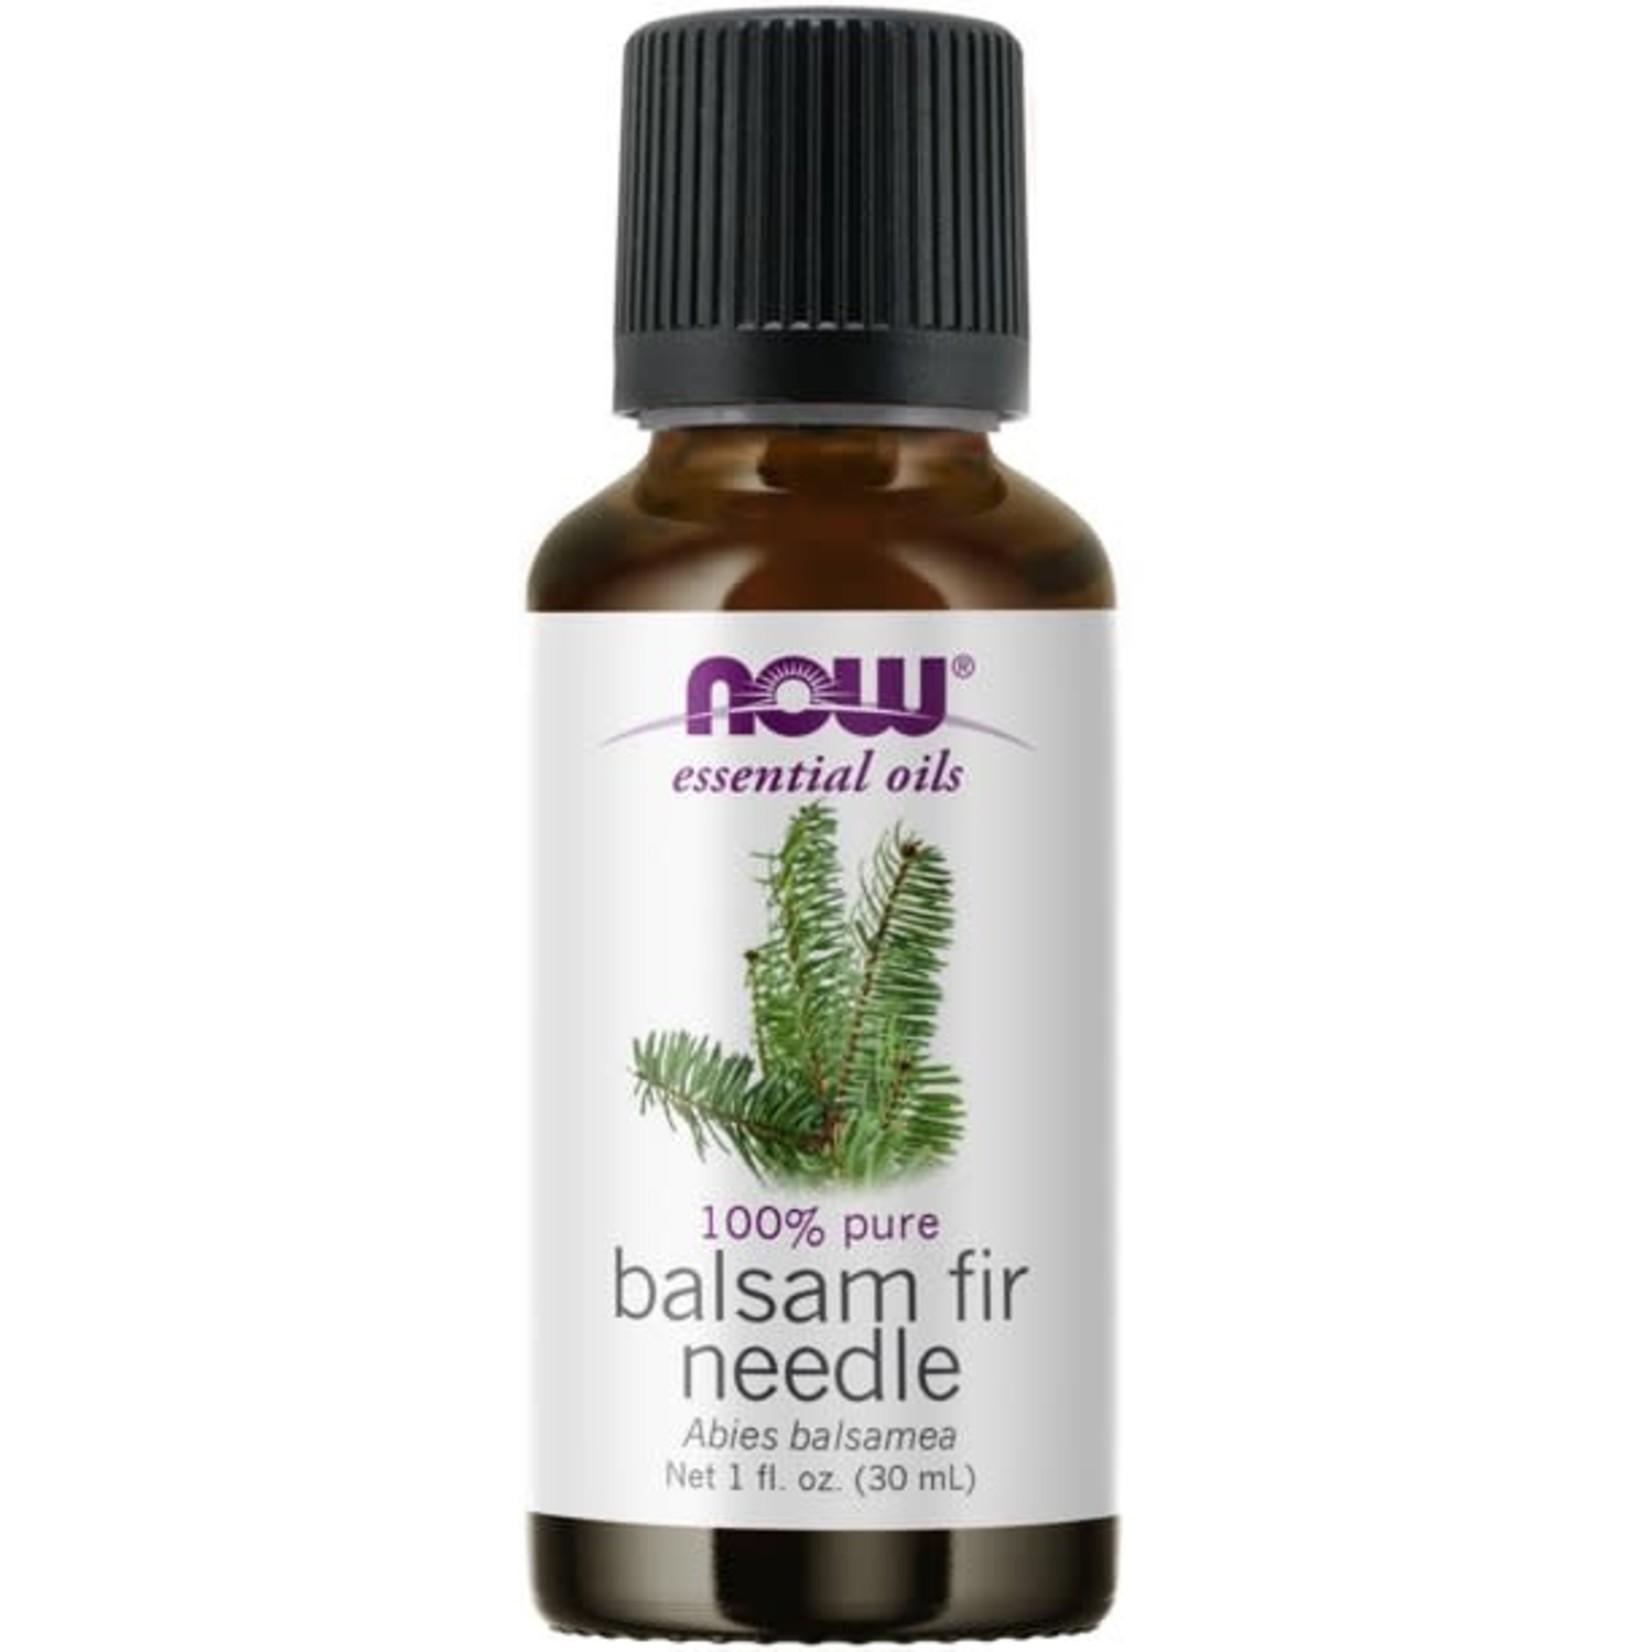 Now Now Balsam Fir Needle Essential Oil 30ml